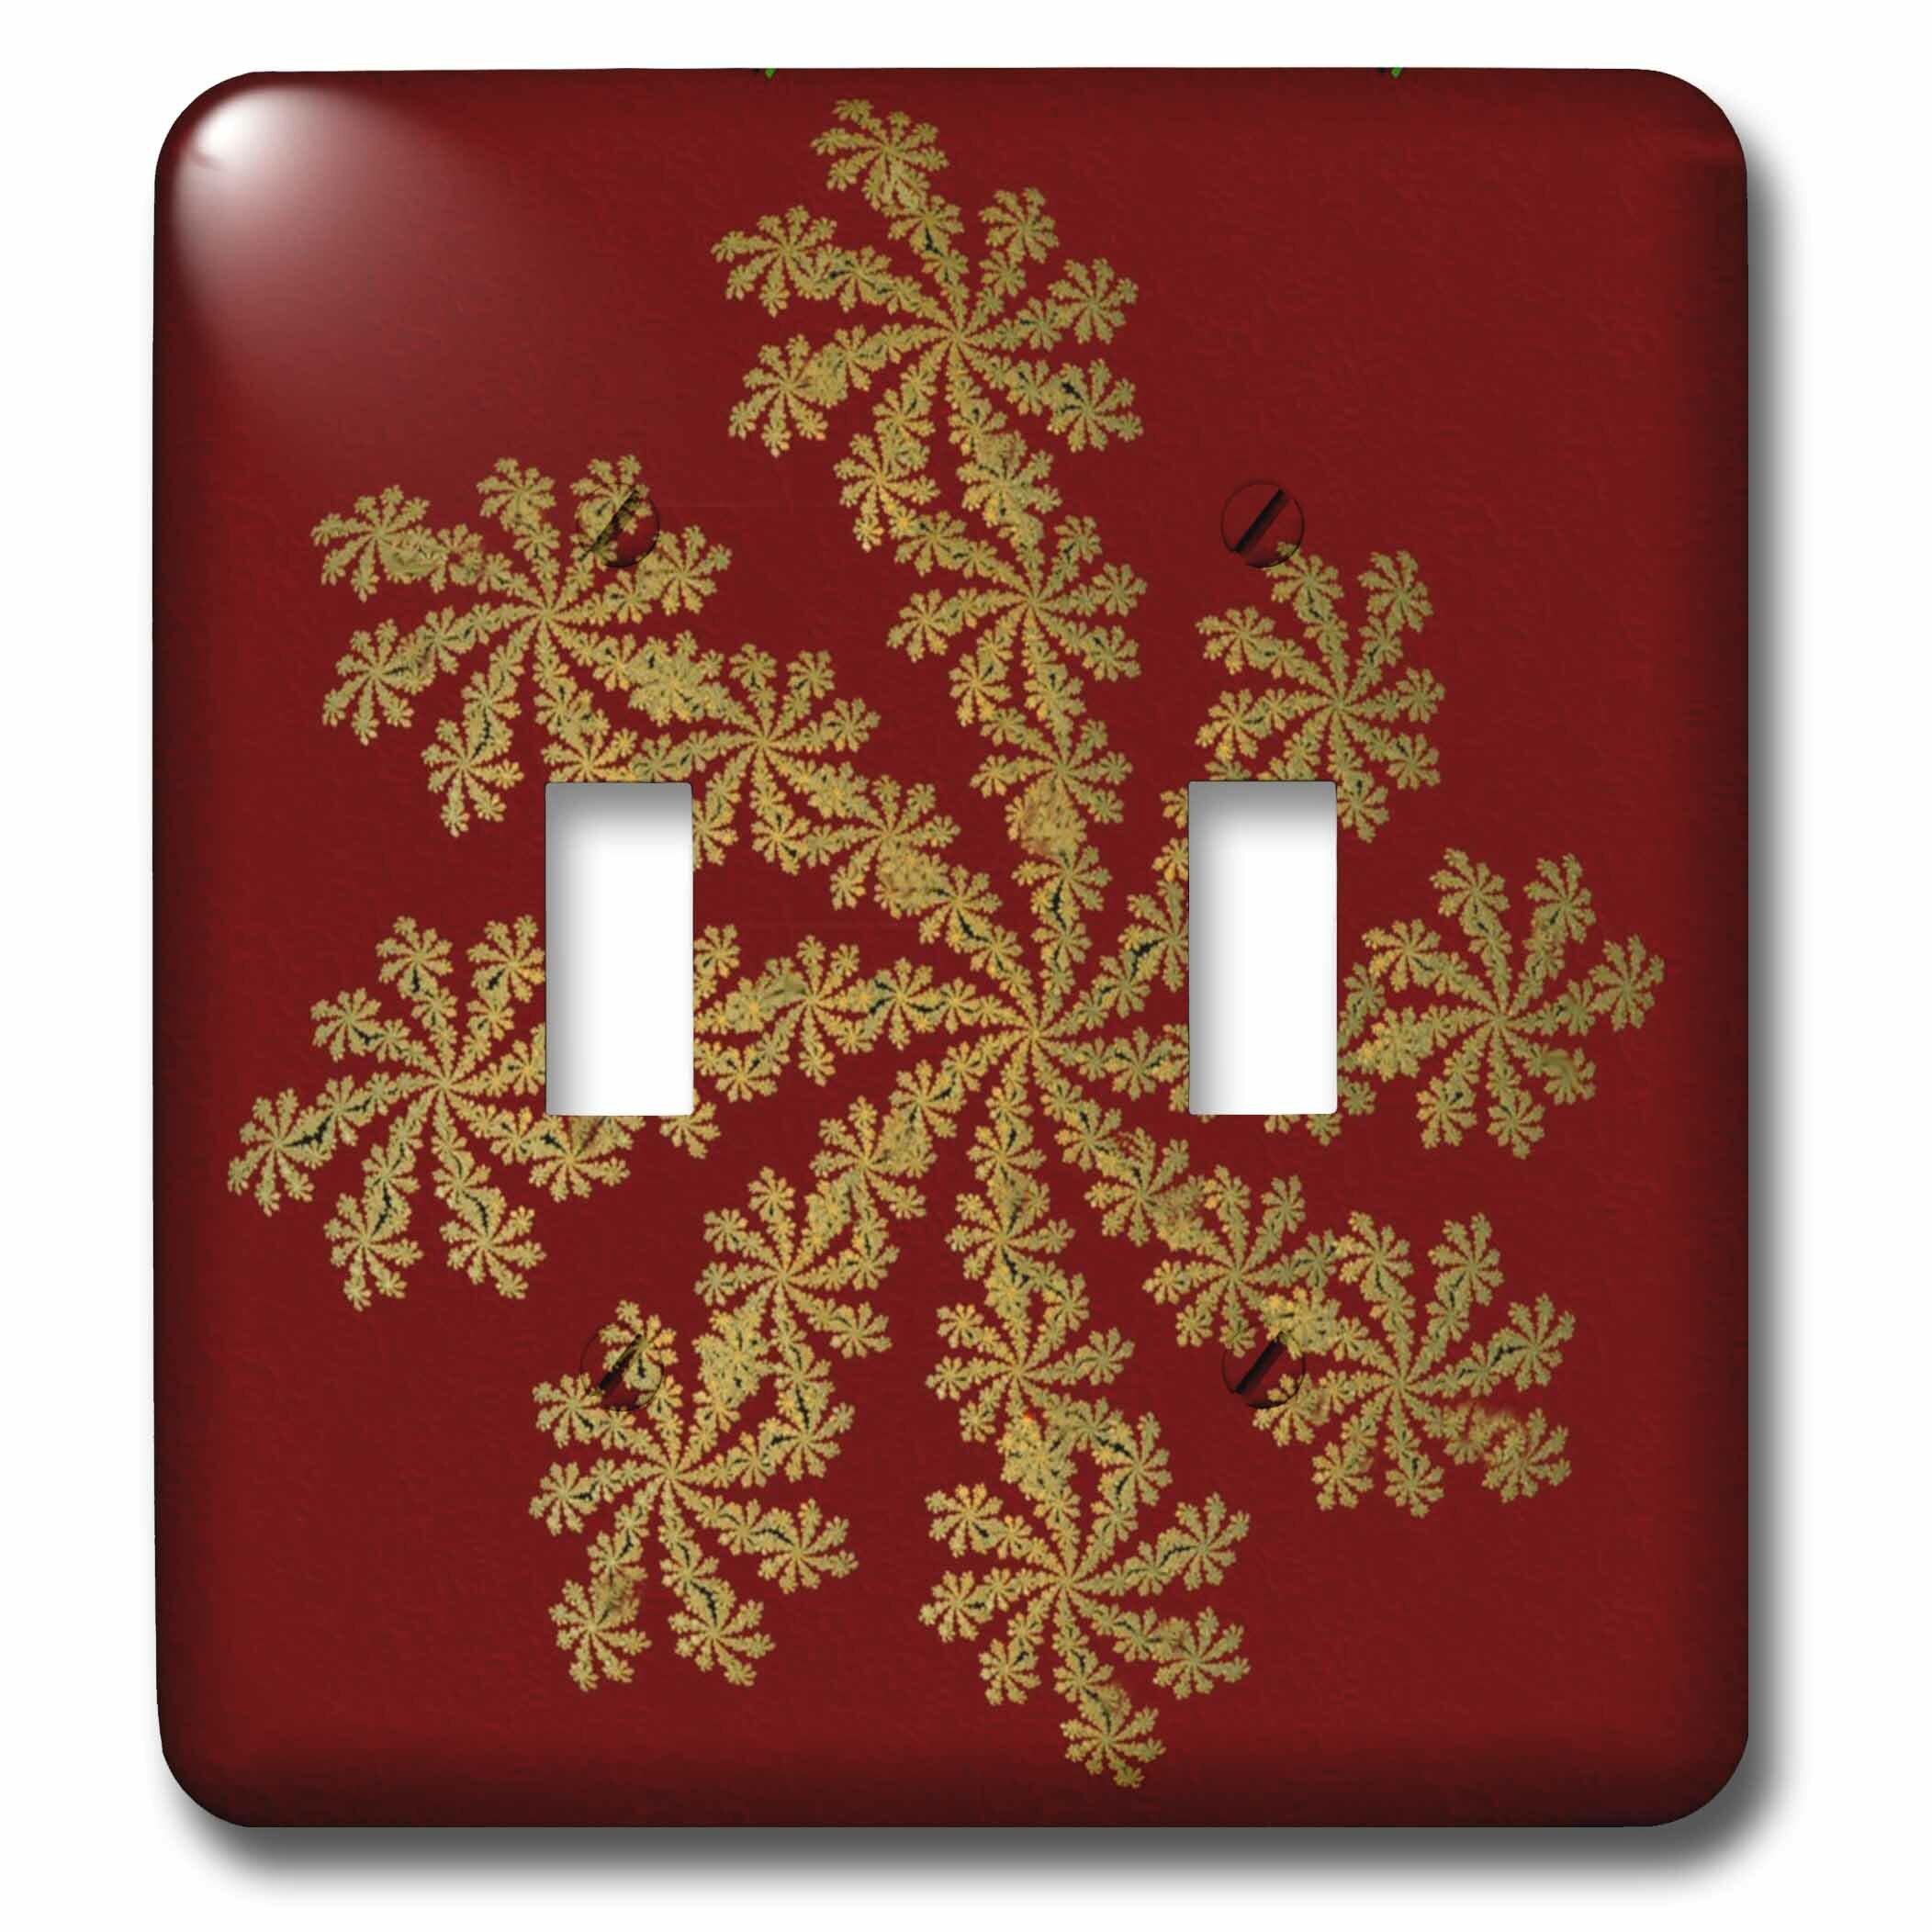 3drose Snowflake 2 Gang Toggle Light Switch Wall Plate Wayfair